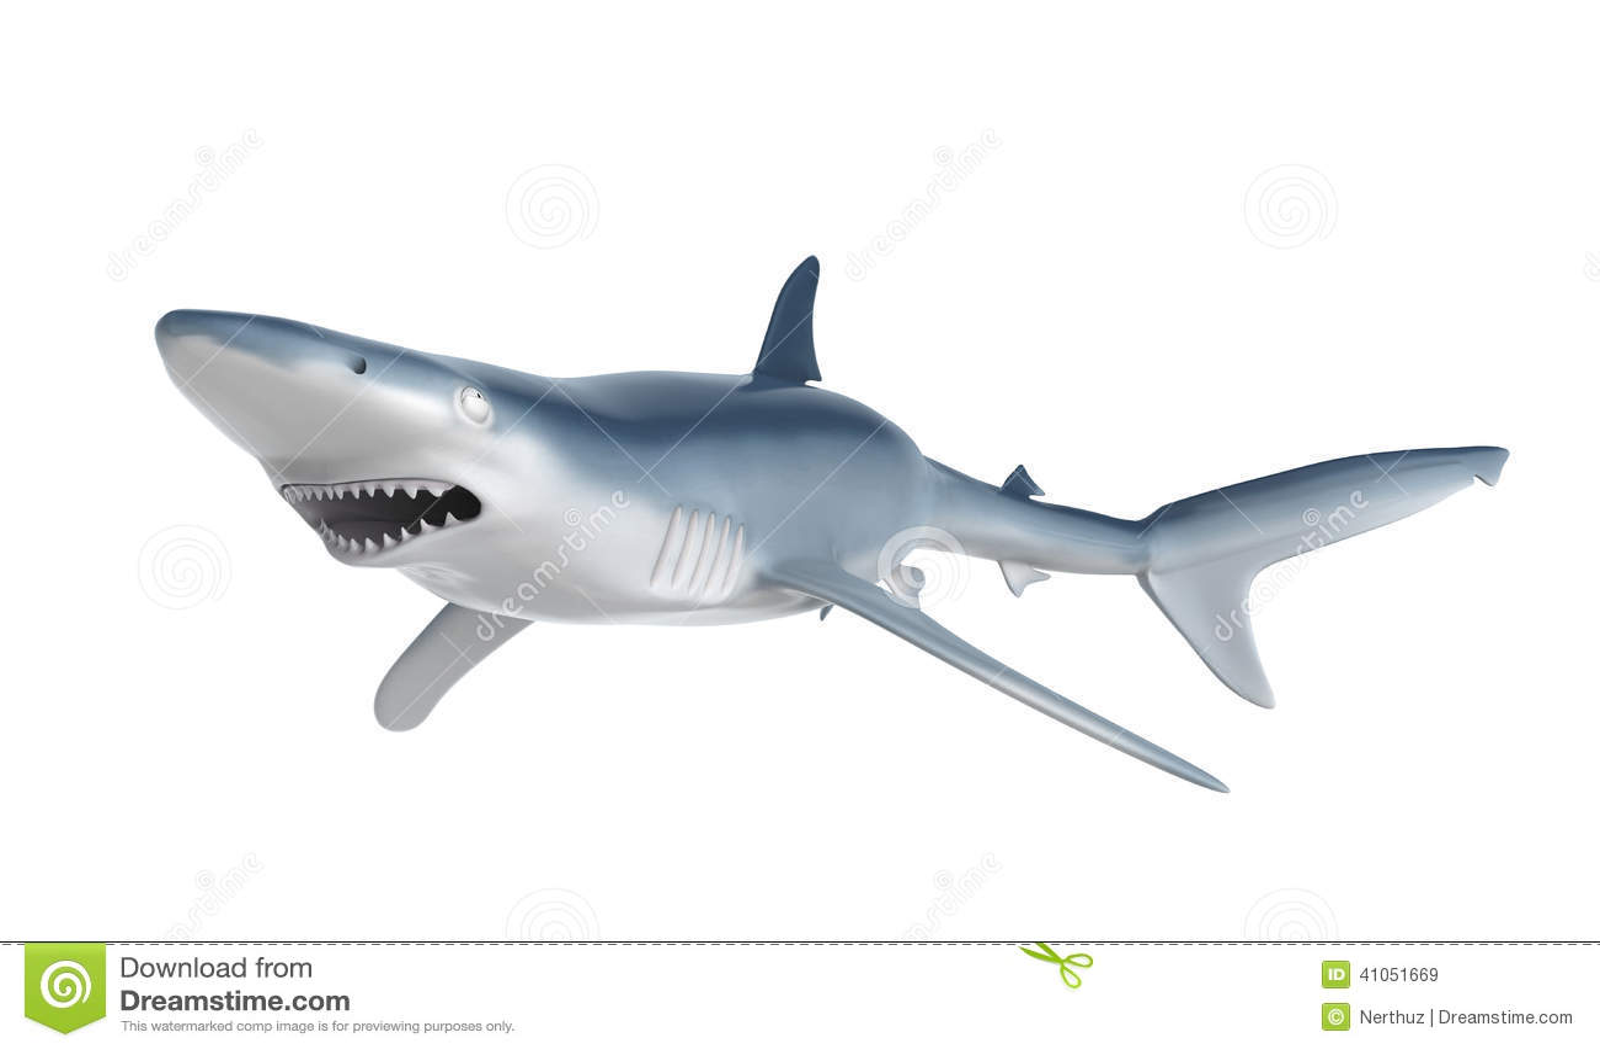 shark fin white background - photo #25